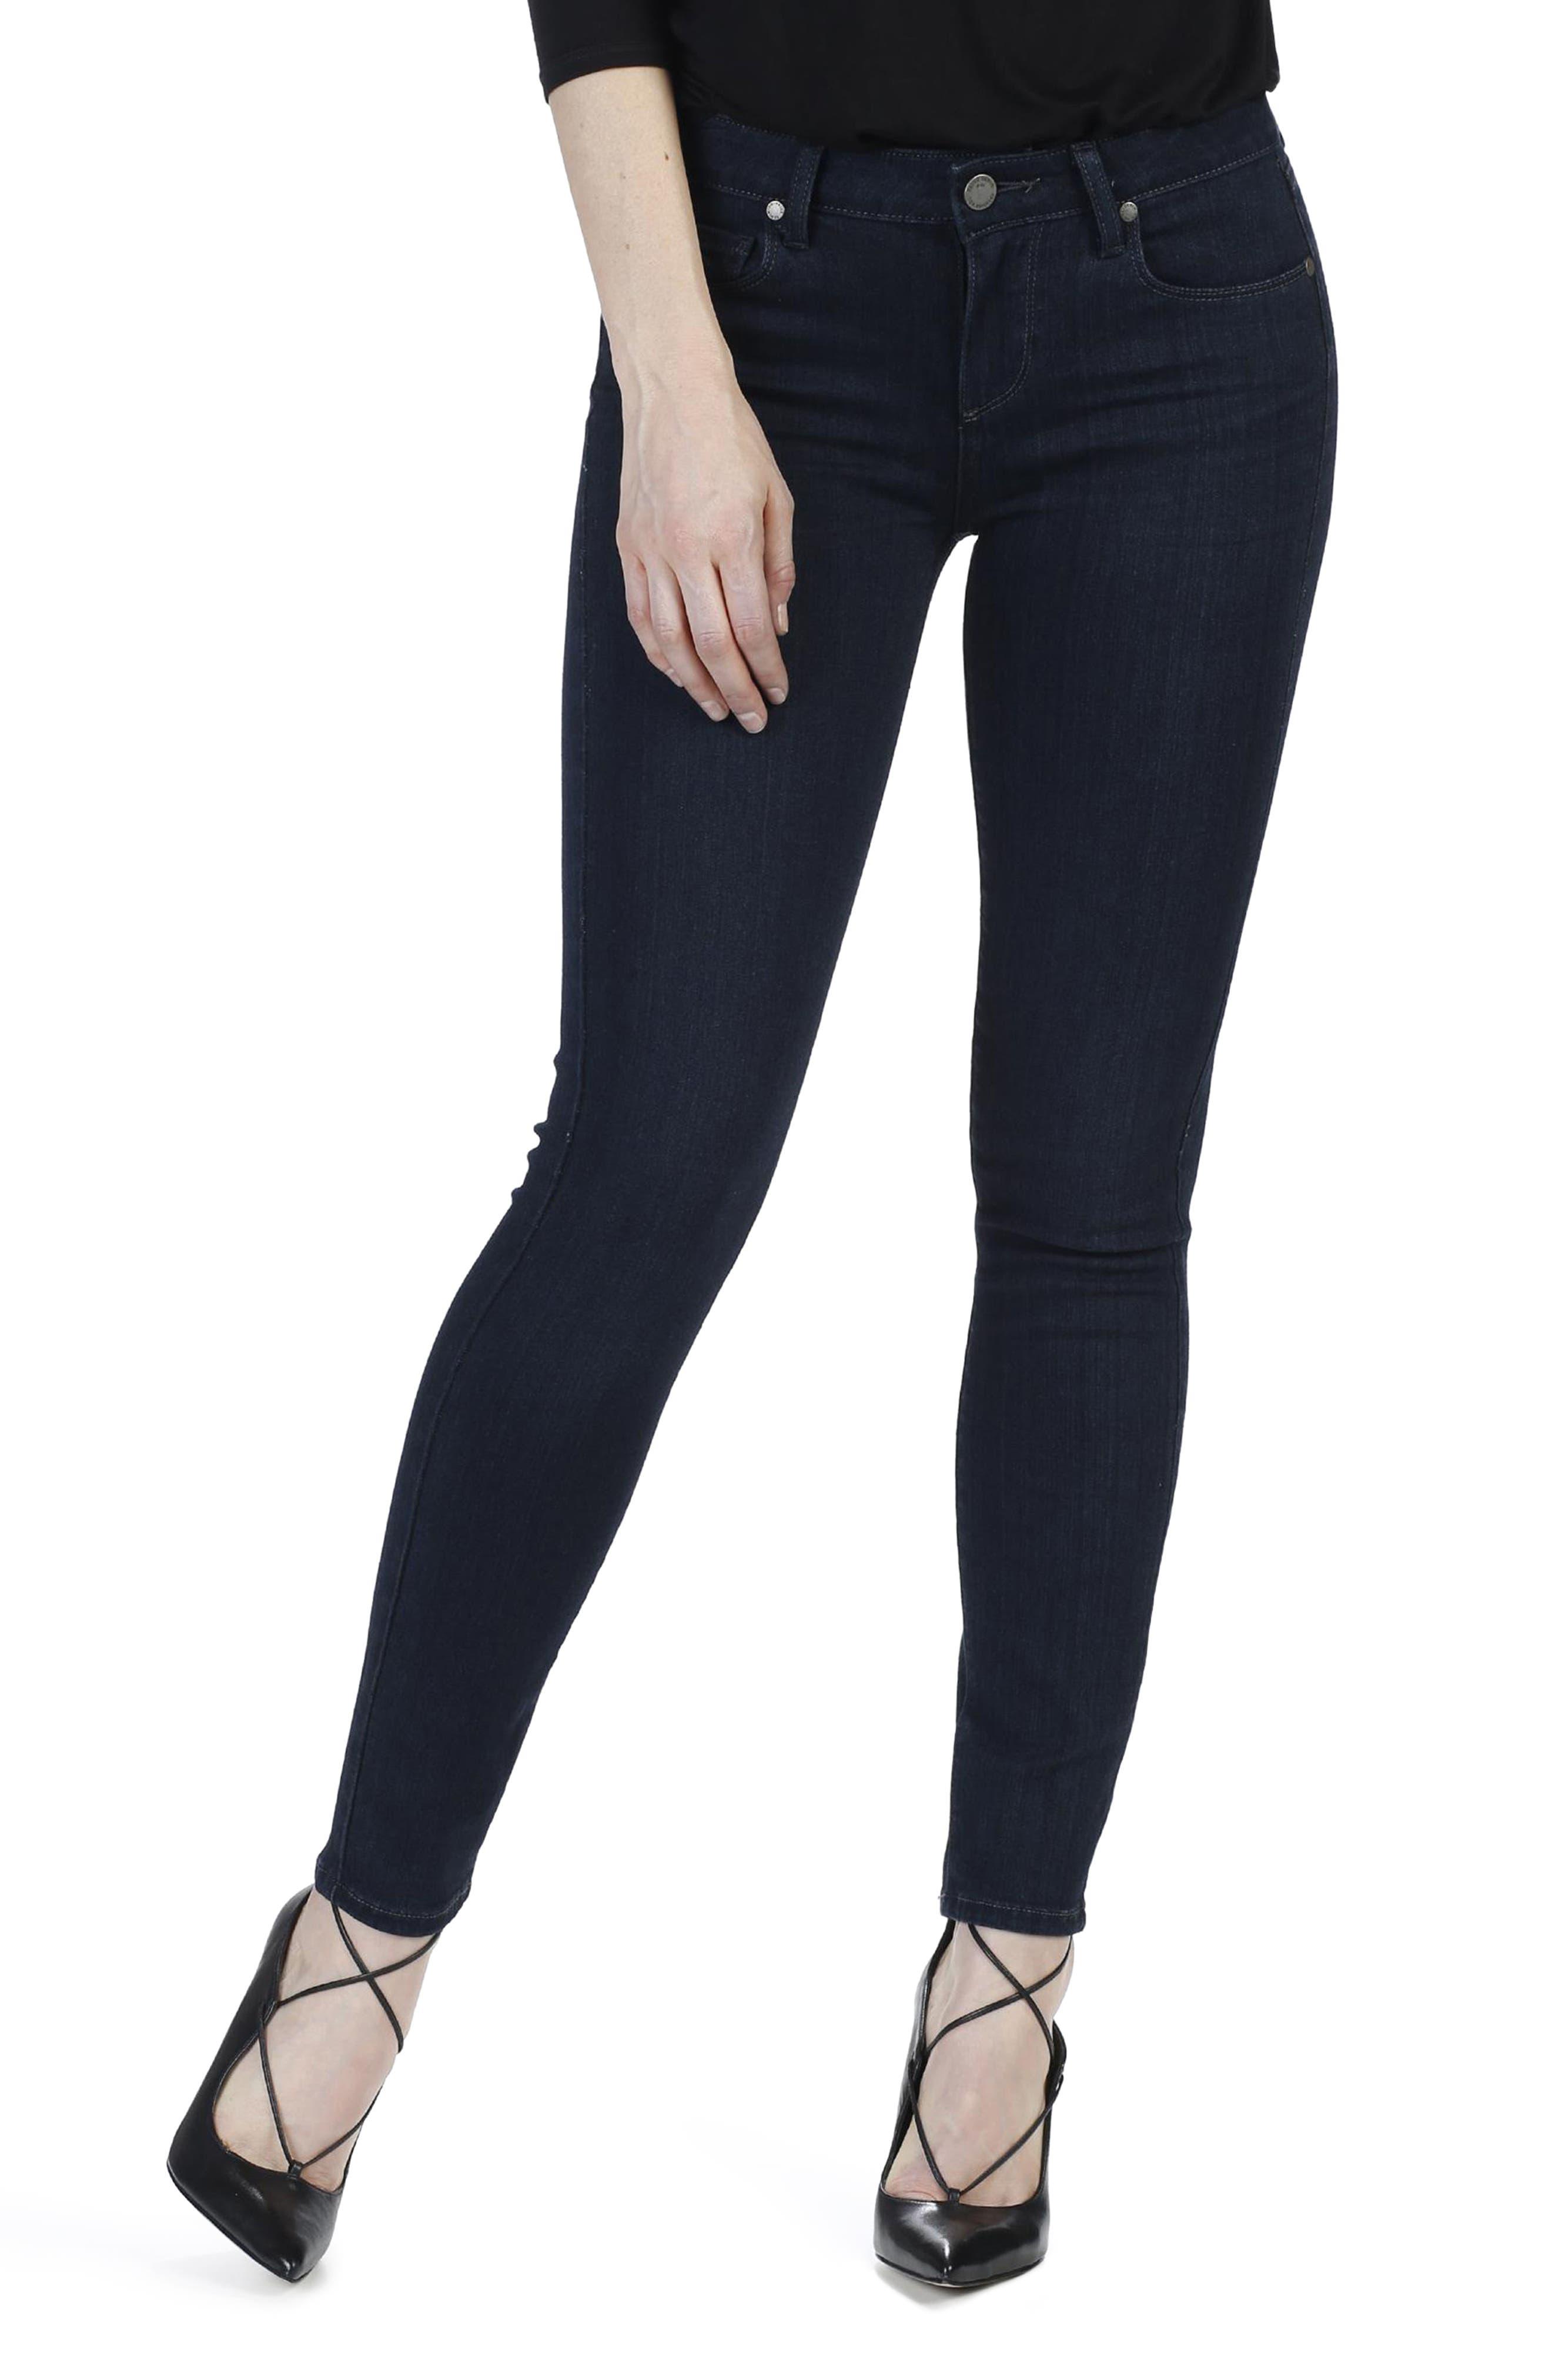 Transcend - Verdugo Ankle Ultra Skinny Jeans,                         Main,                         color, Dalton